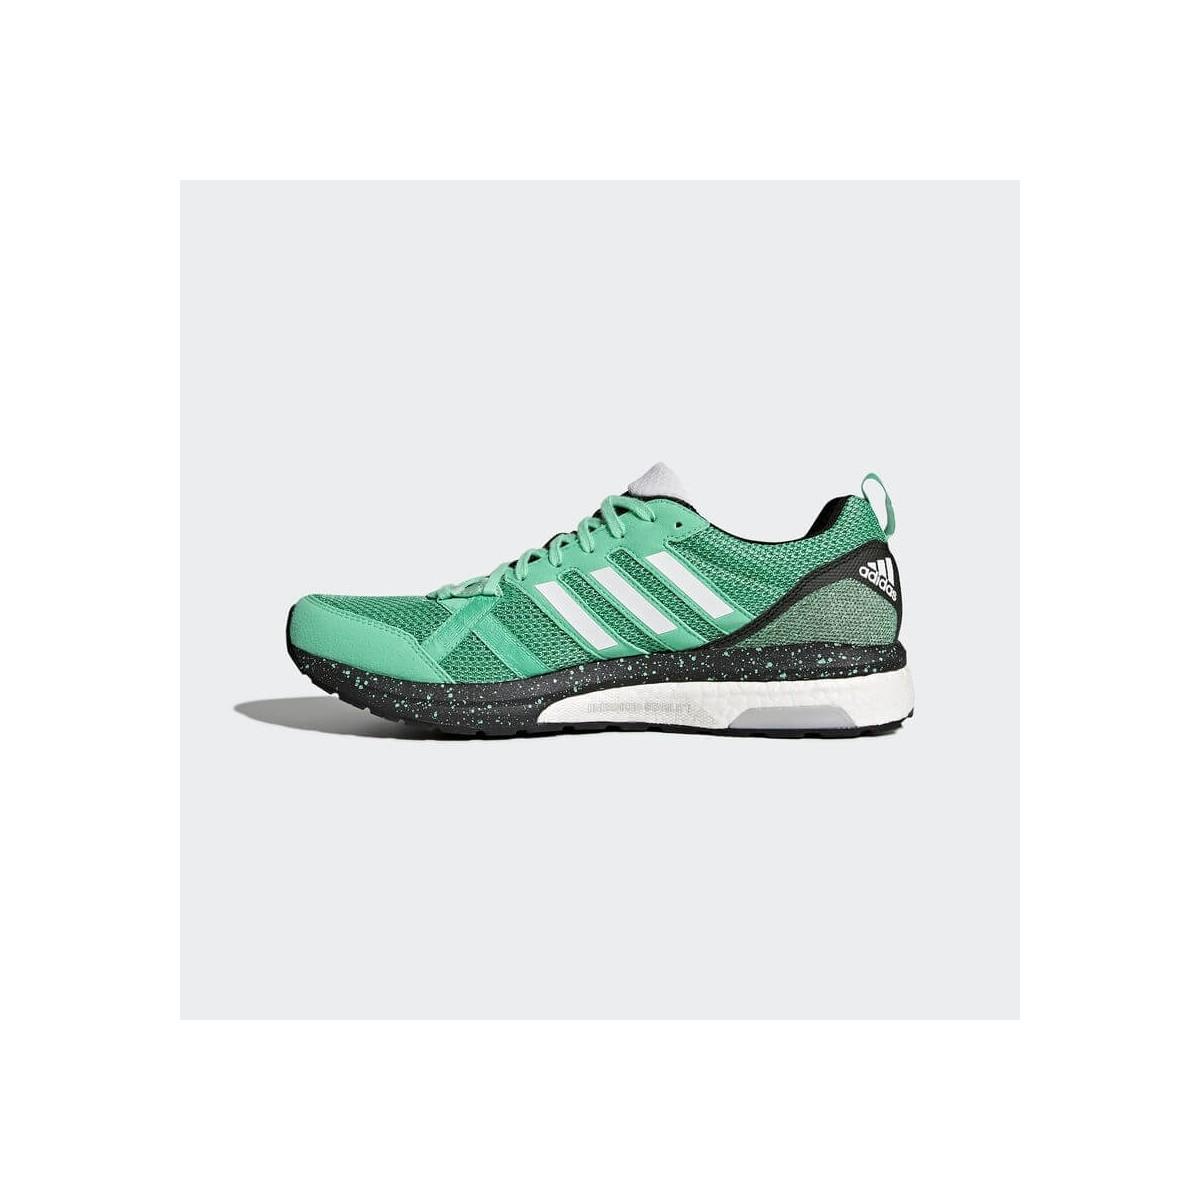 Zapatillas Adidas Adizero Tempo 9 aktiv PV18